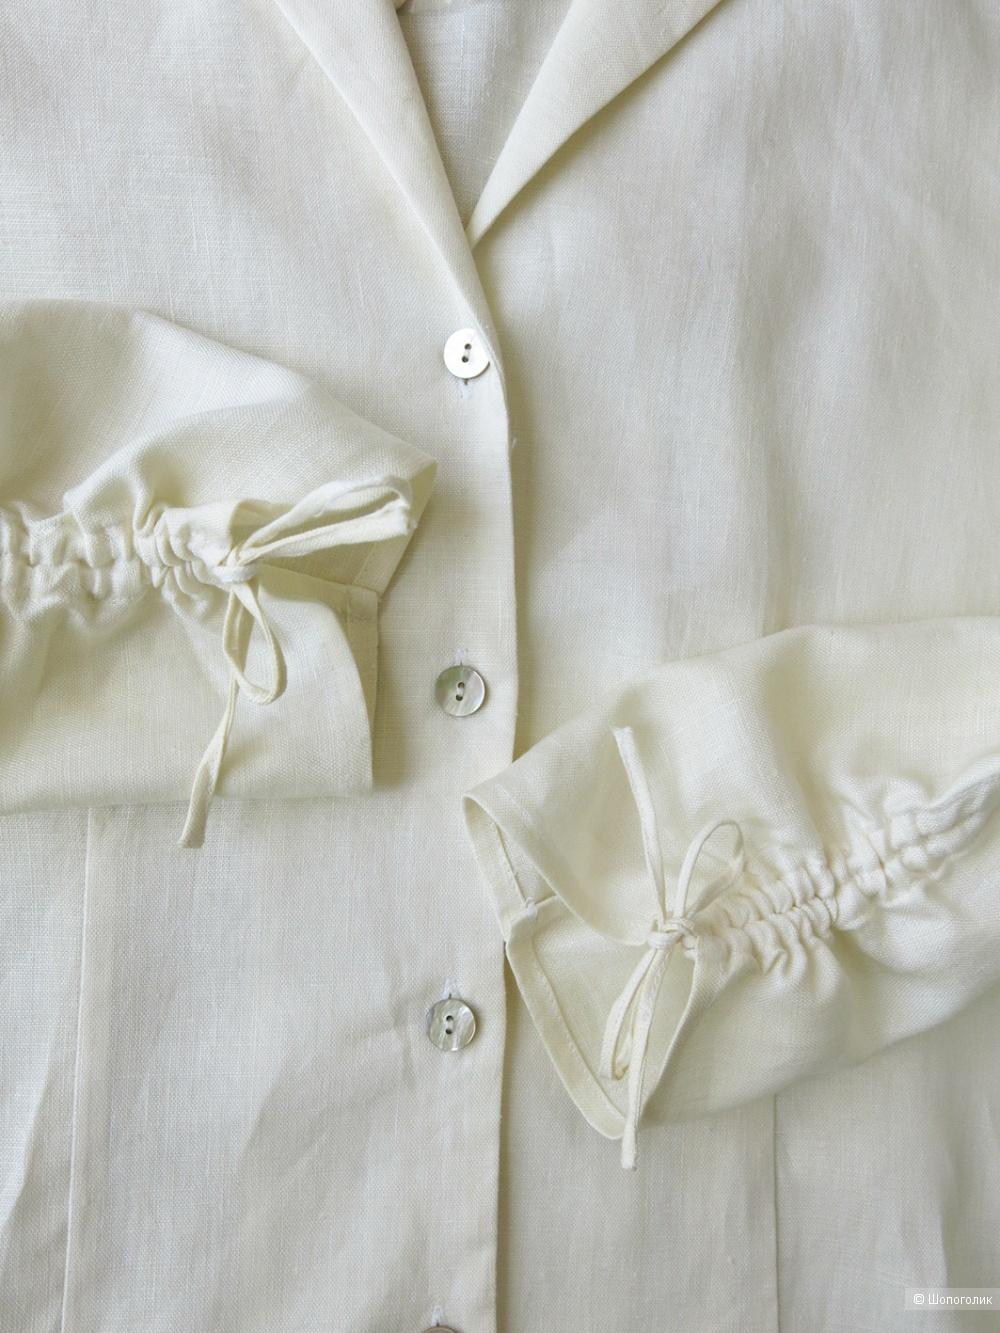 Блузка/рубашка Petite Sophisticate MP (M-L) 46-48